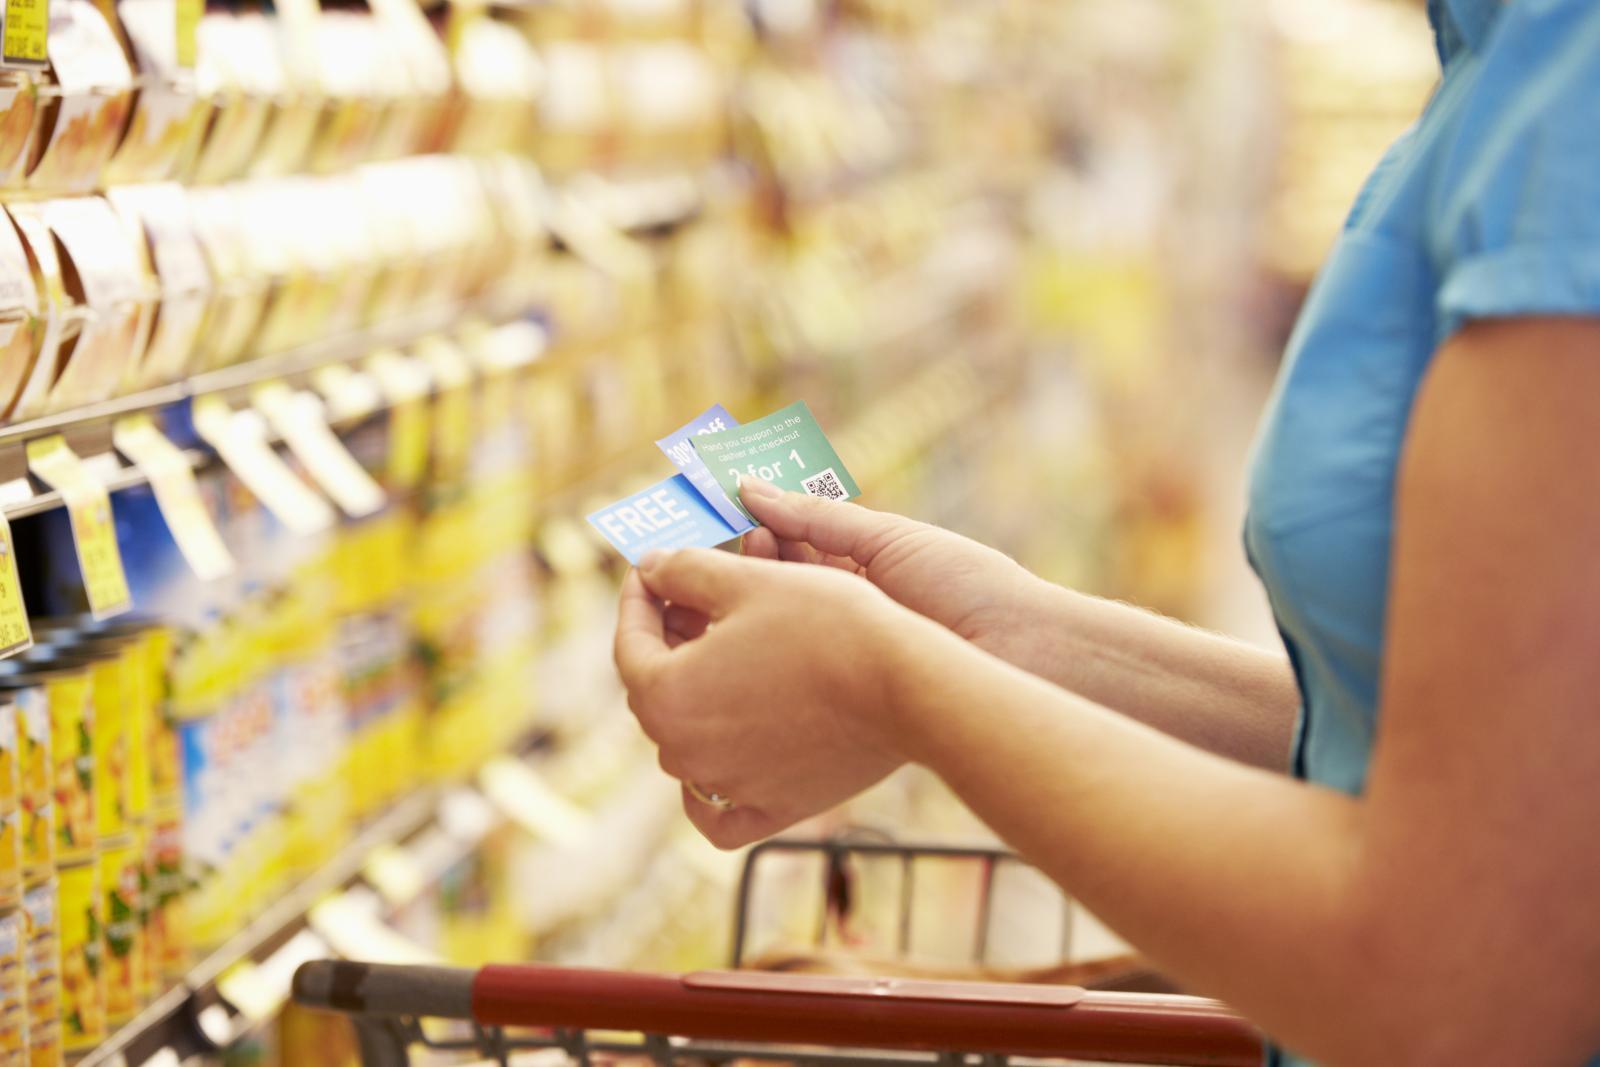 female extreme couponer needs storage solutions